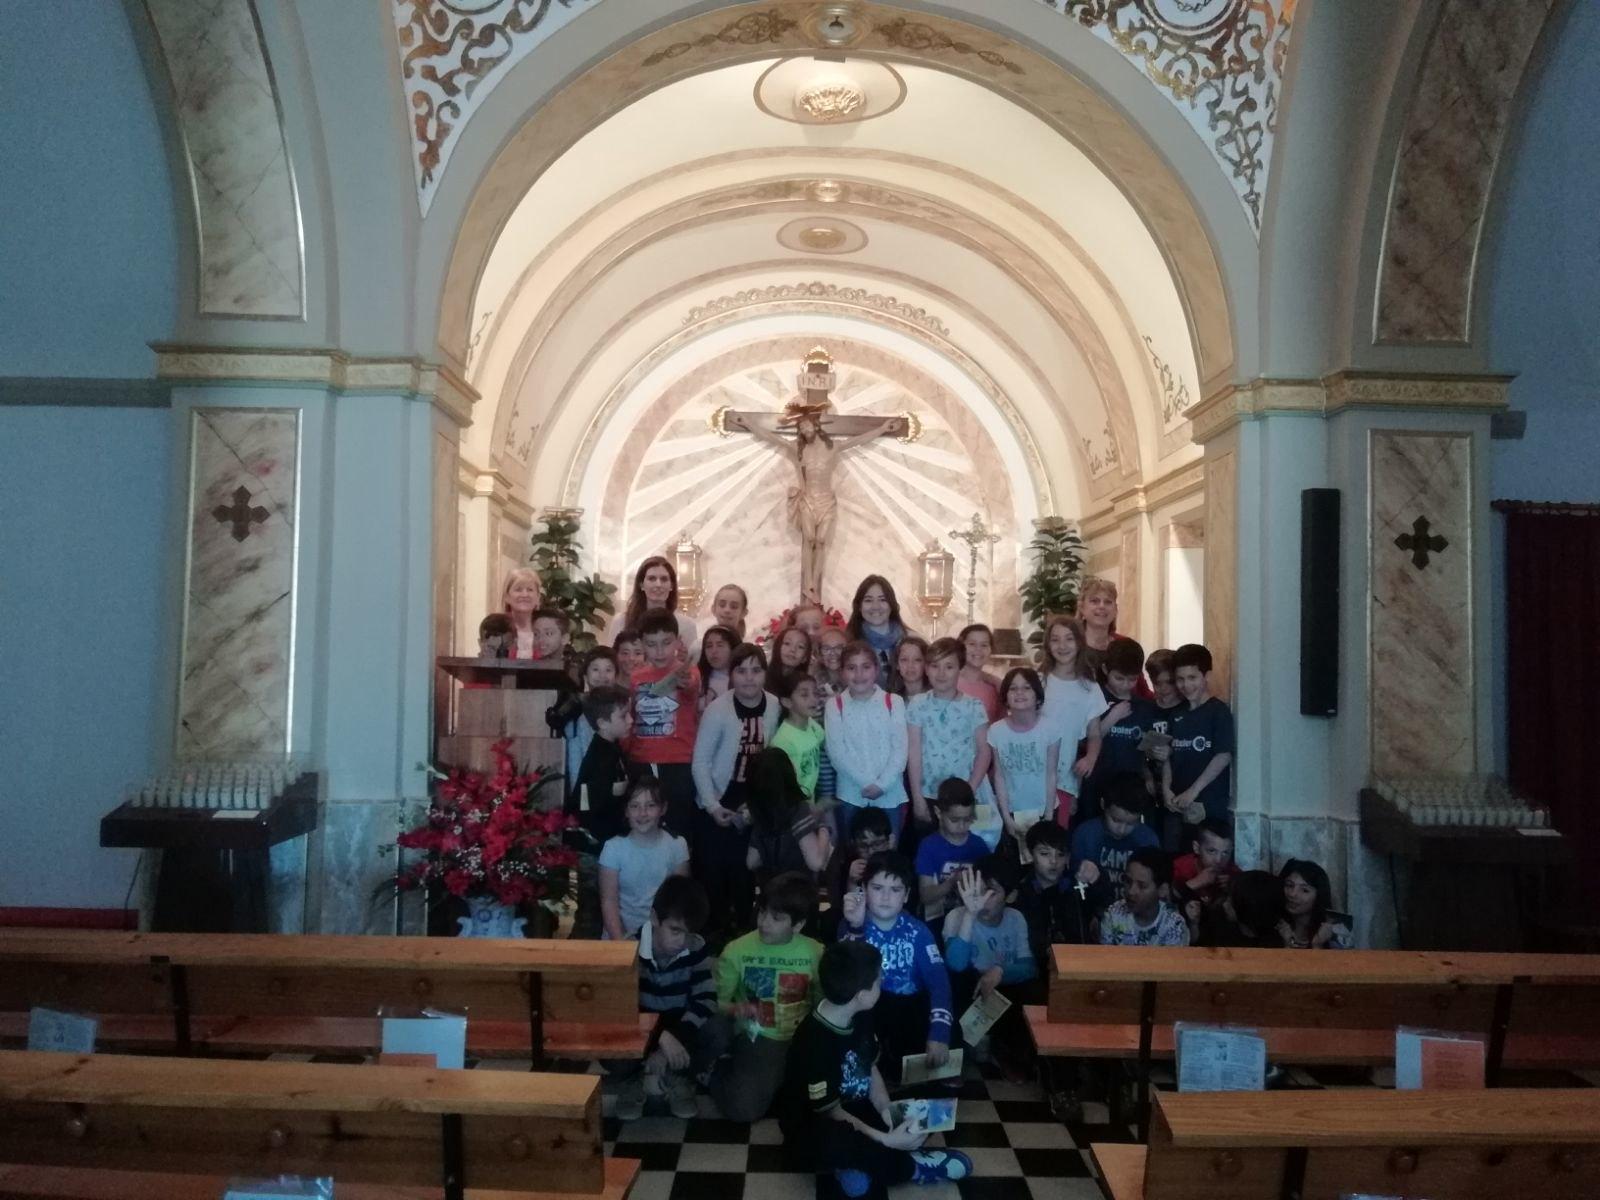 (2018-04-18) - Visita ermita alumnos Beatriz-Carmina-Lucía,3º,La Foia - María Isabel Berenguer Brotons - (10)